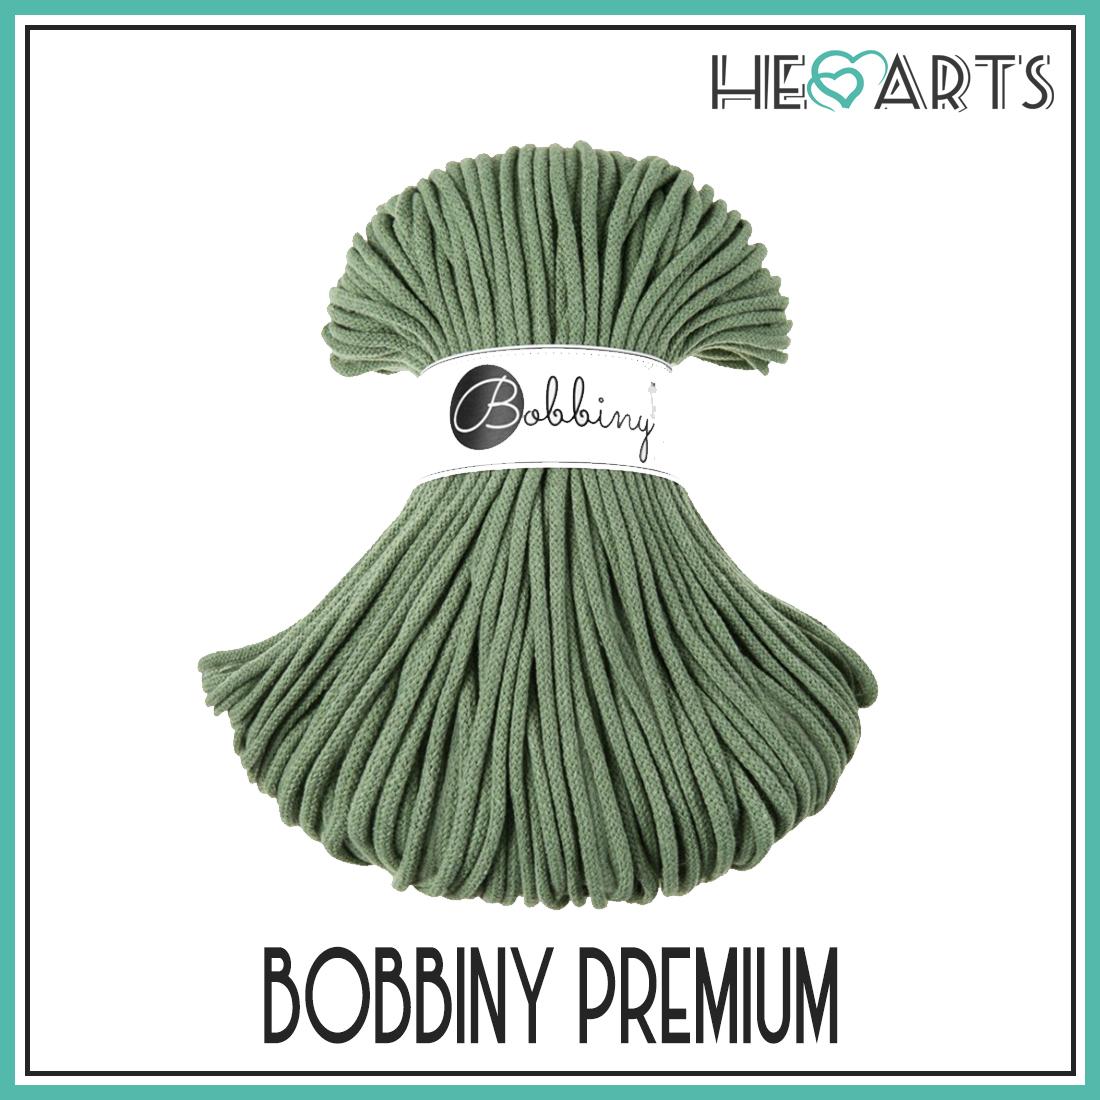 bobbiny premium 5 mm